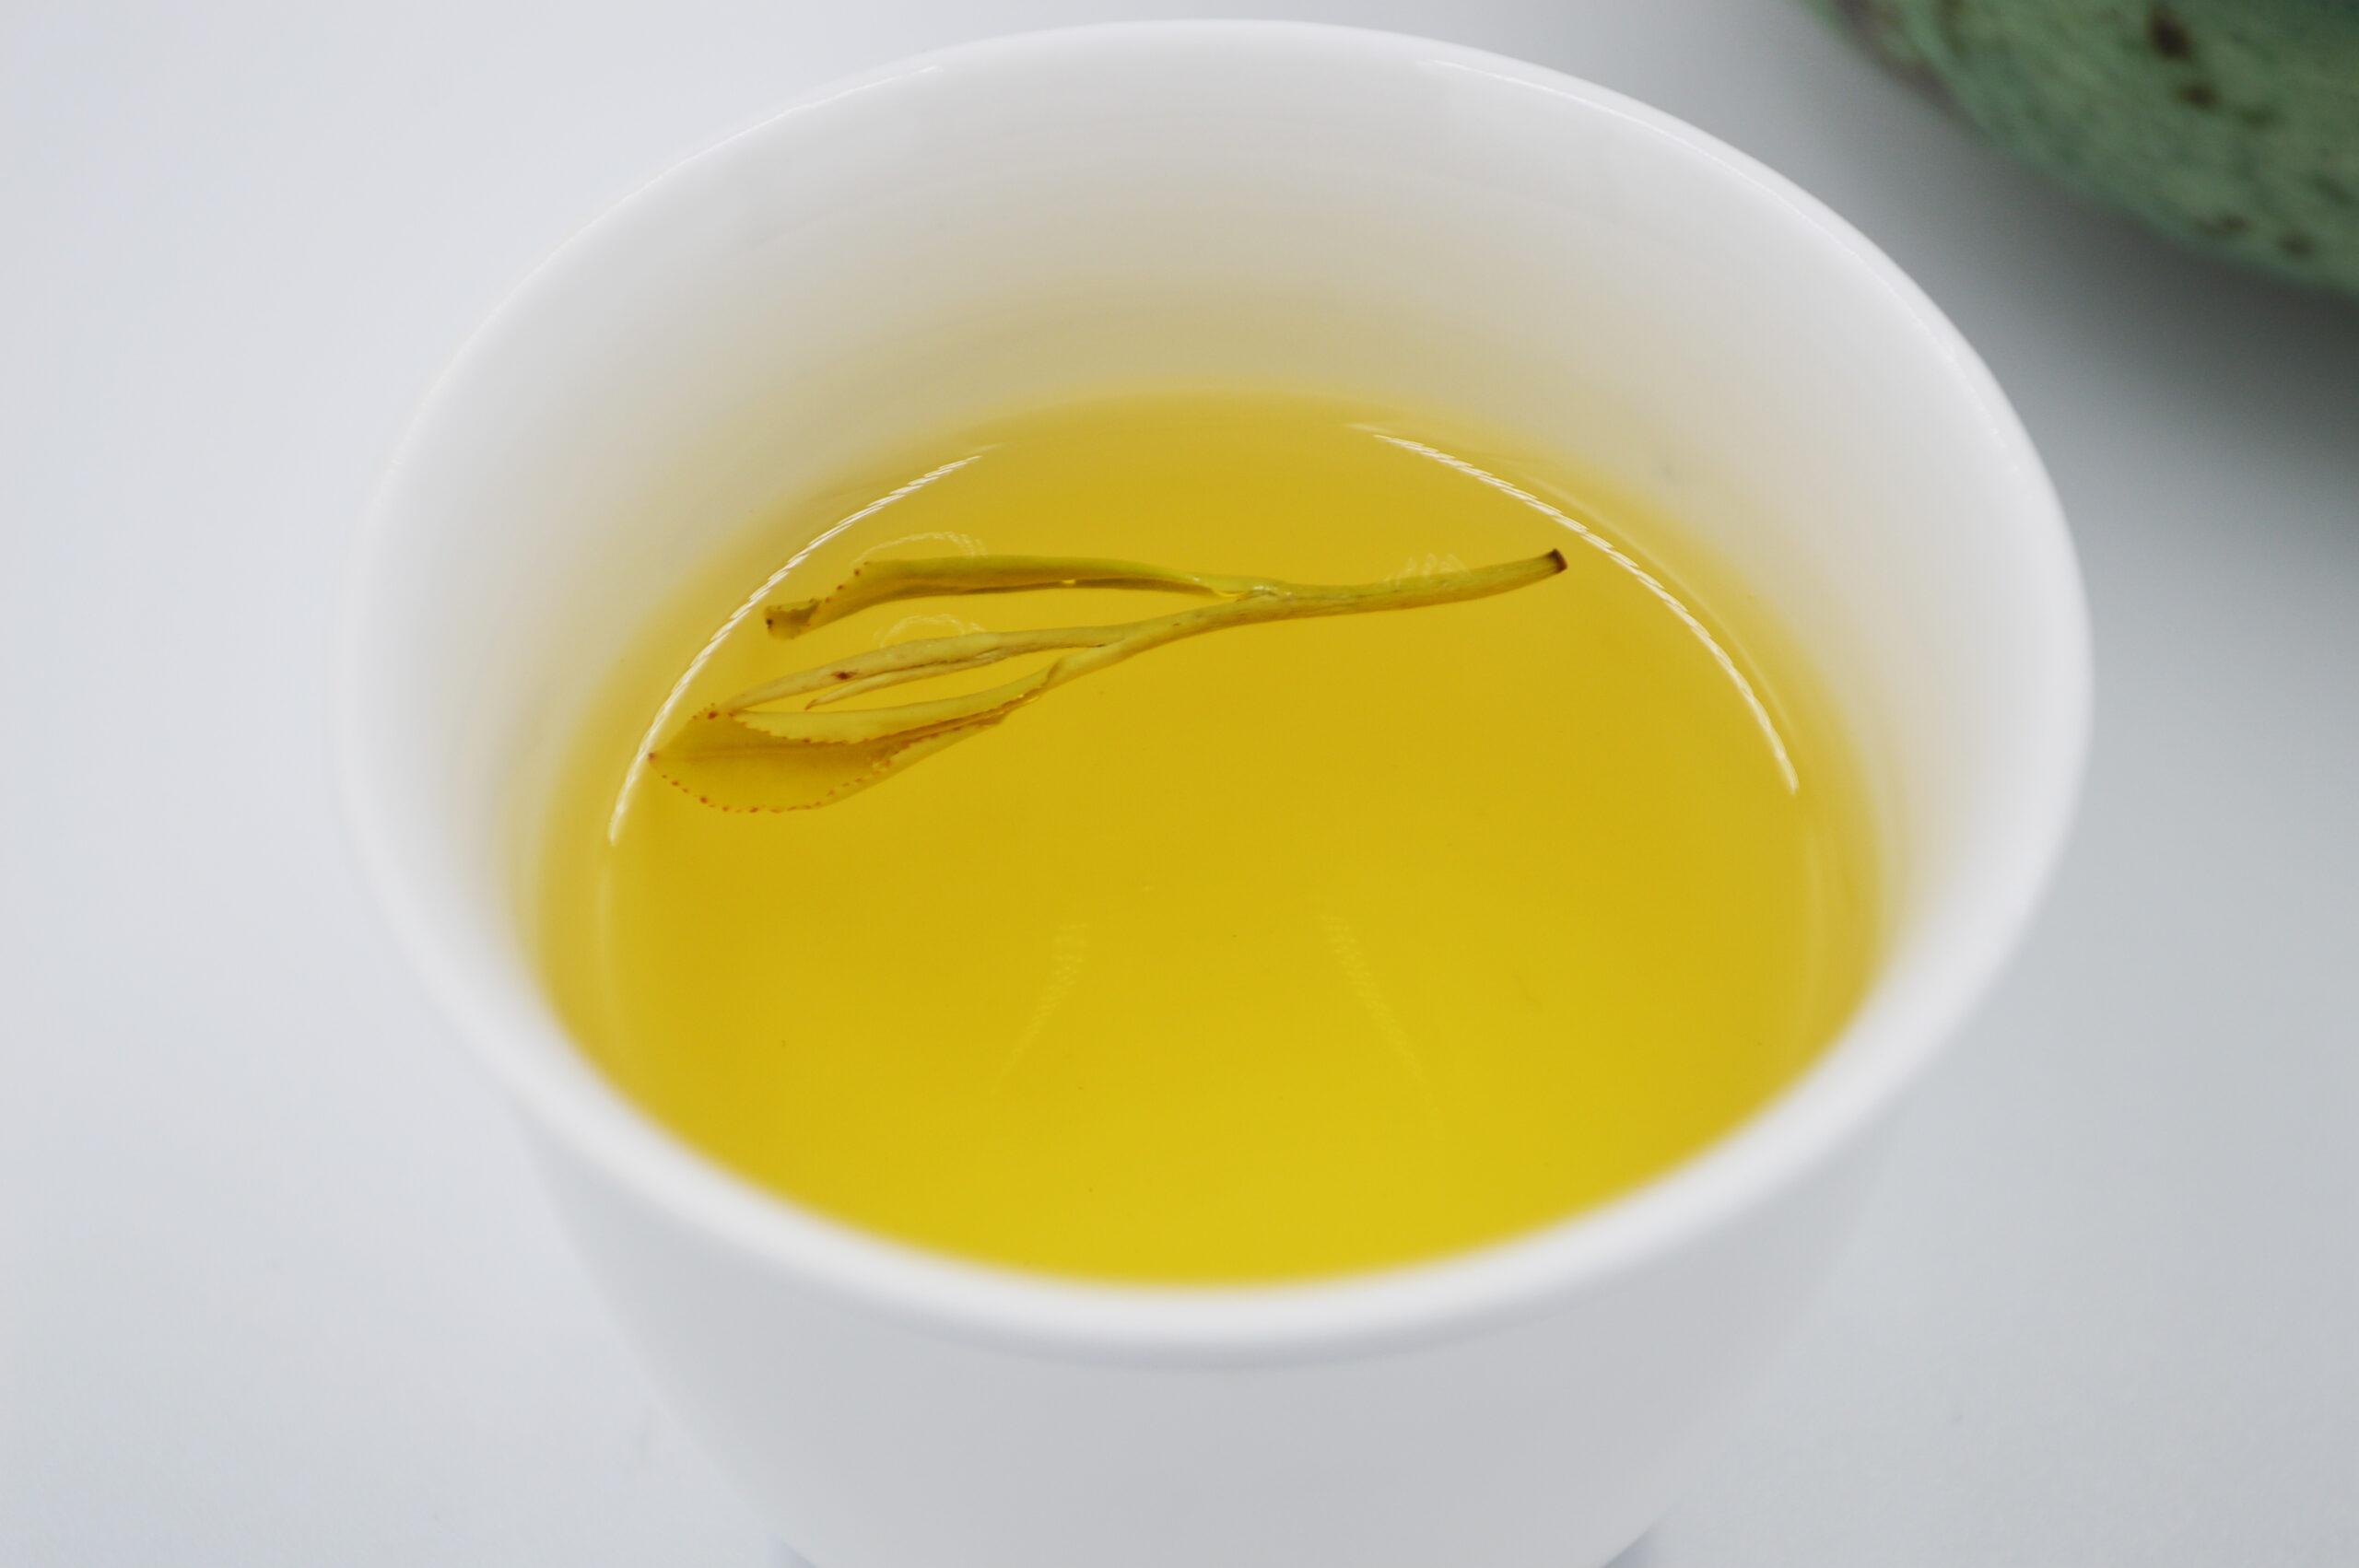 https://shop.liu-tea-art.com/wp-content/uploads/2021/04/DSC_00181-1-scaled.jpg